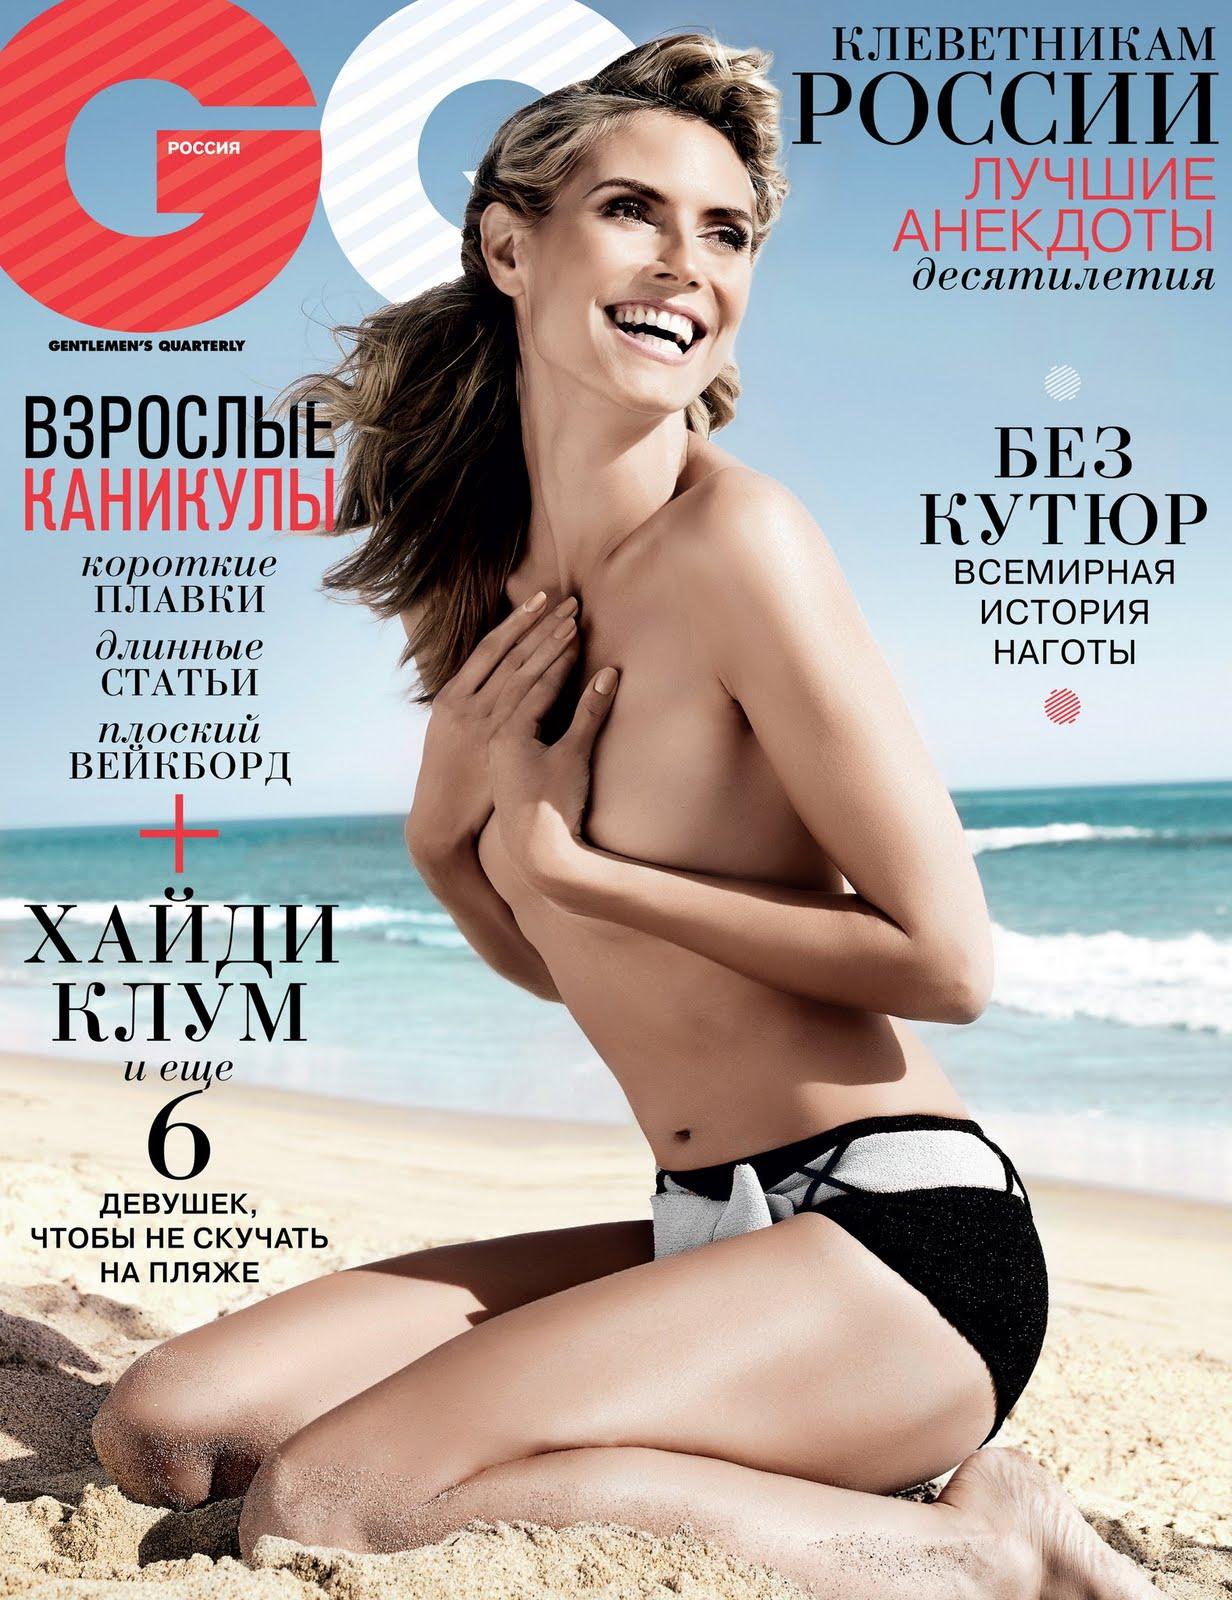 http://4.bp.blogspot.com/-ndVRyhSjtM8/ThCob7e6EYI/AAAAAAAAQOg/v2yiOaEA2ME/s1600/Heidi%2BKlum%2Bby%2BRankin%2B%2528GQ%2BRussia%2BJuly%2B2011%2529.jpg